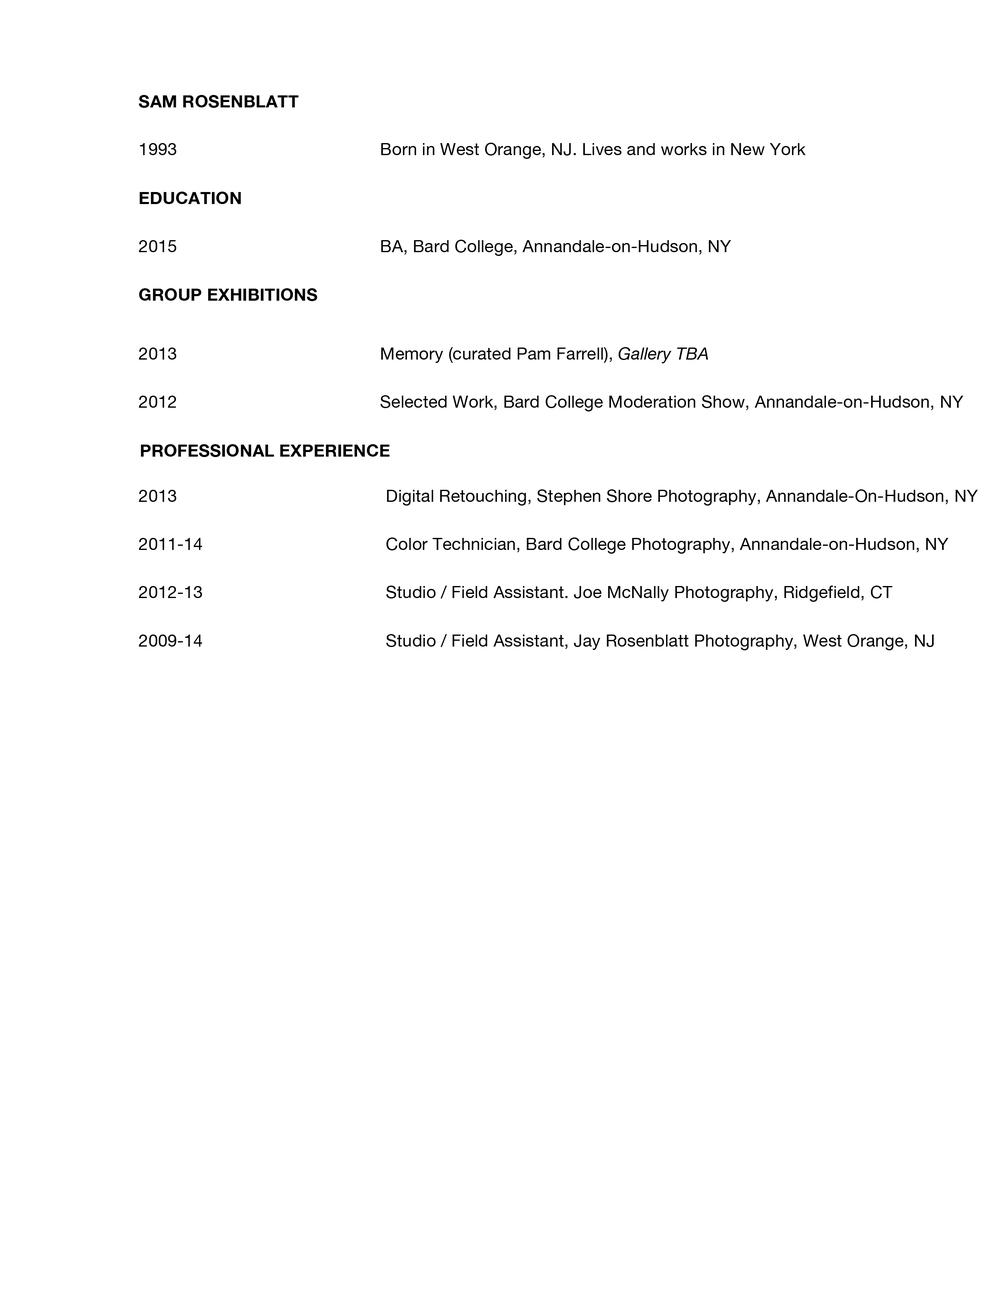 SAM ROSENBLATT CV.jpg